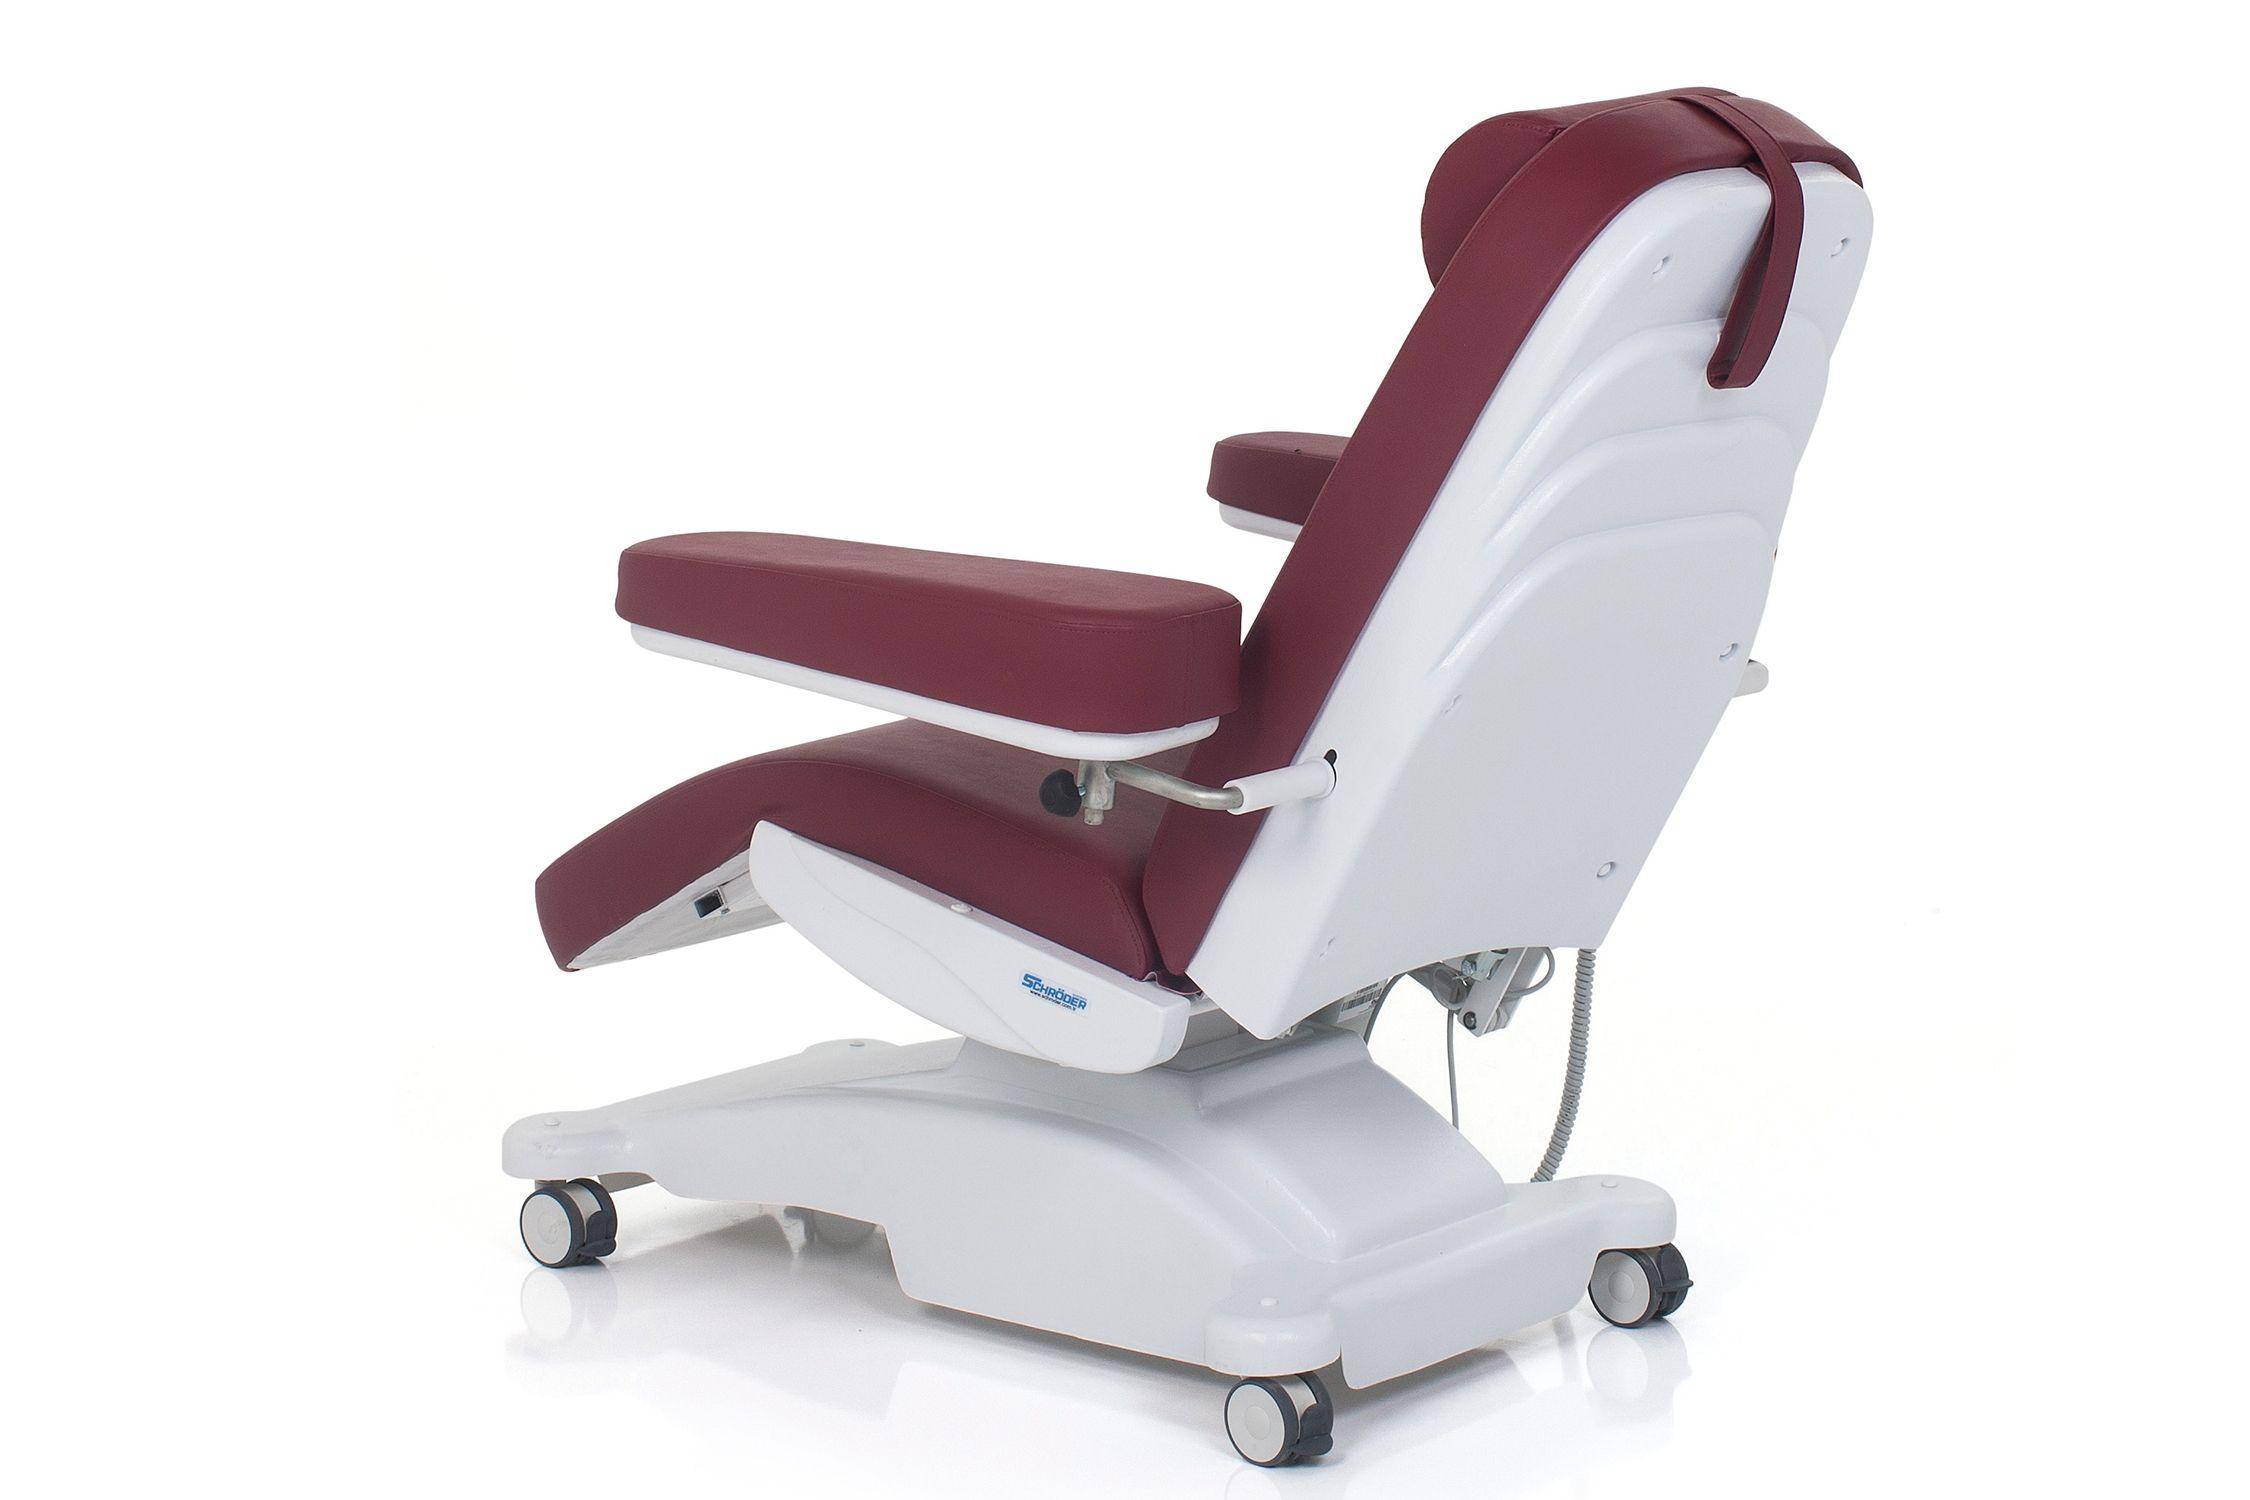 Tremendous Schroder Blood Drawing Chair Ile Ilgili Gorsel Sonucu Inzonedesignstudio Interior Chair Design Inzonedesignstudiocom